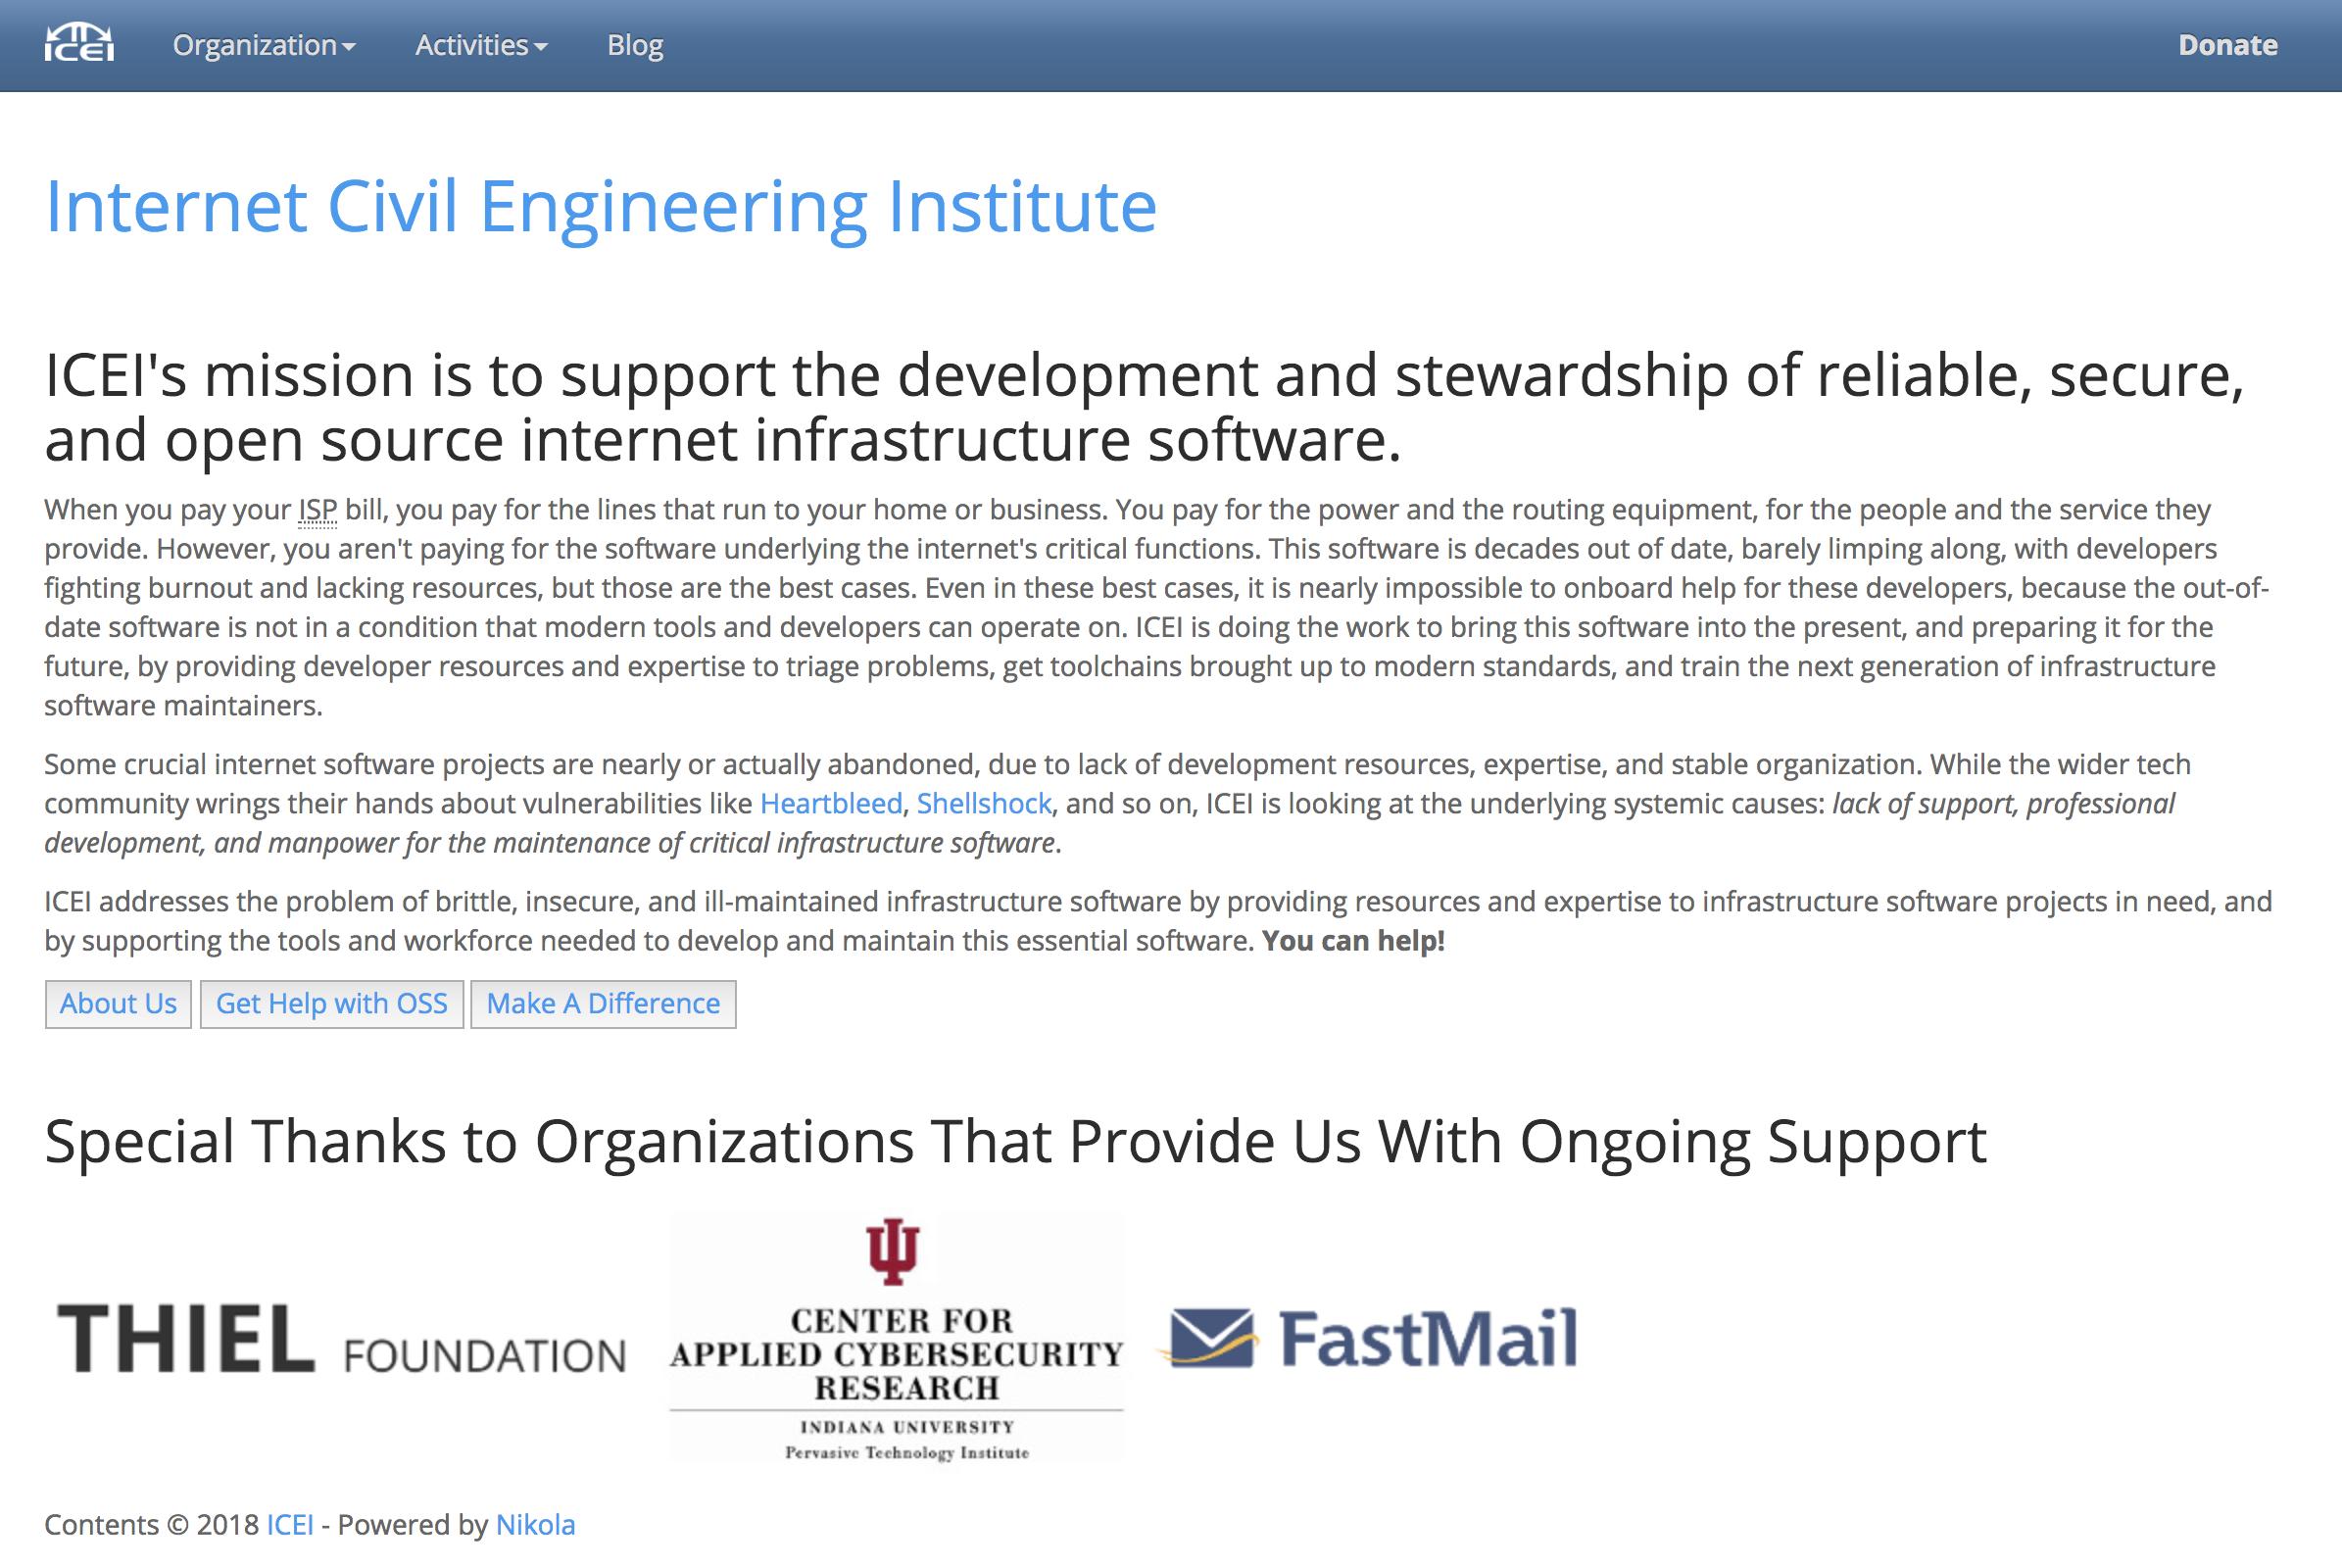 Internet Civil Engineering Institute - Founding Board Member